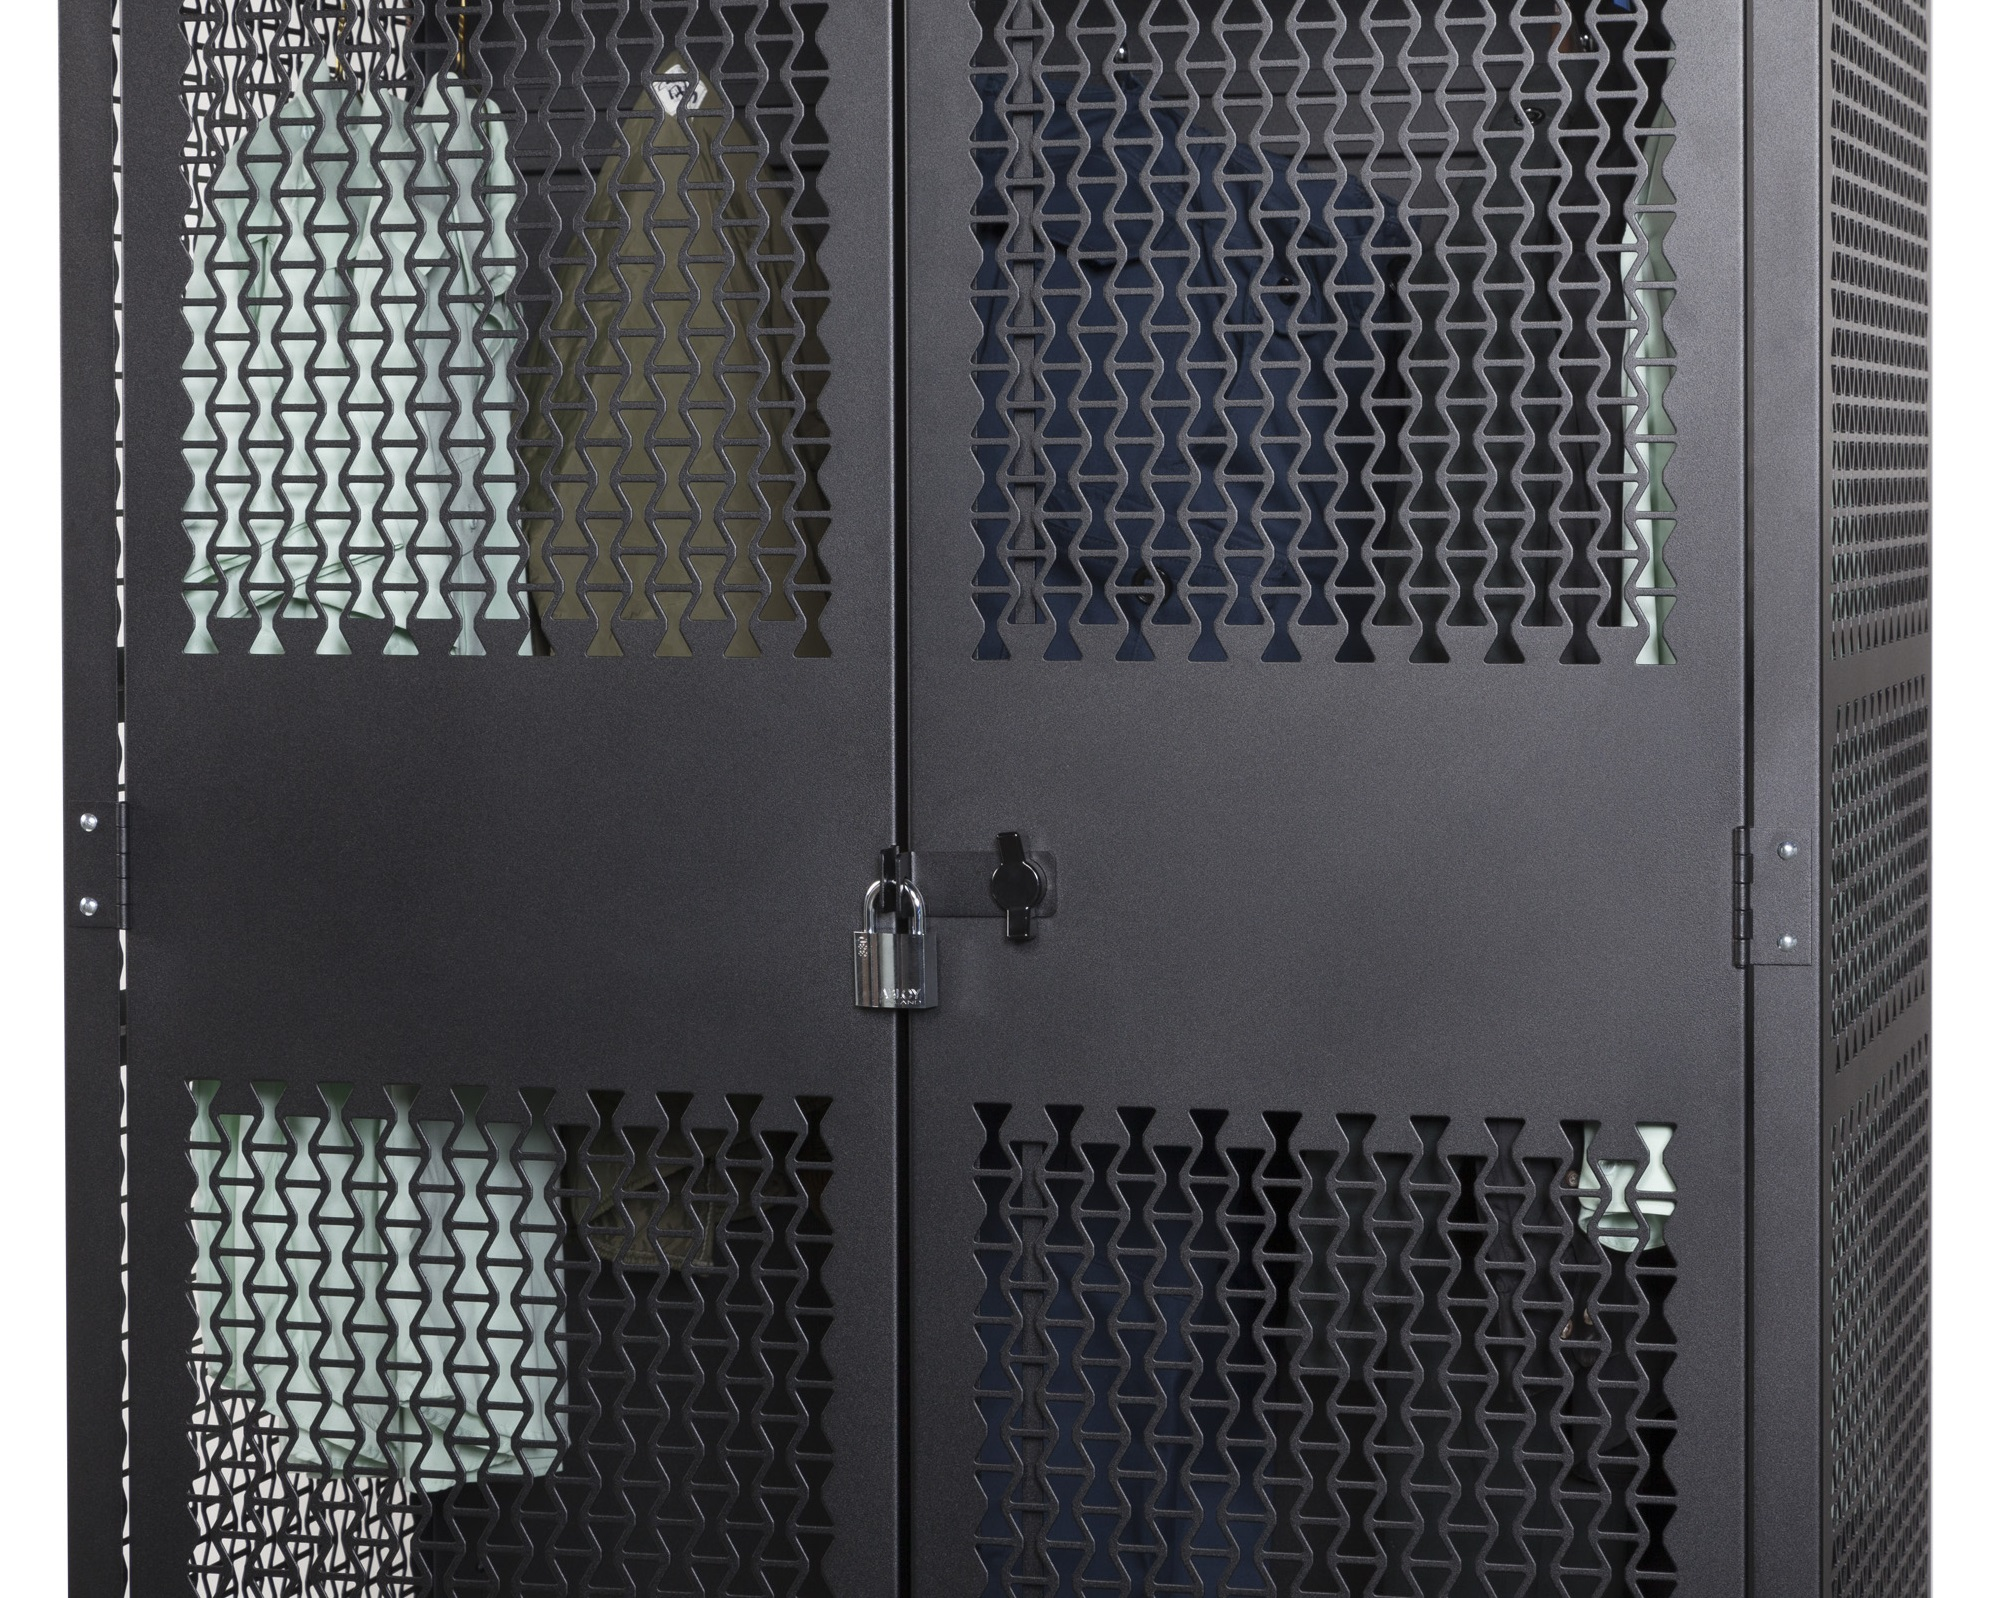 TA-50 Storage Locker_5 cropped